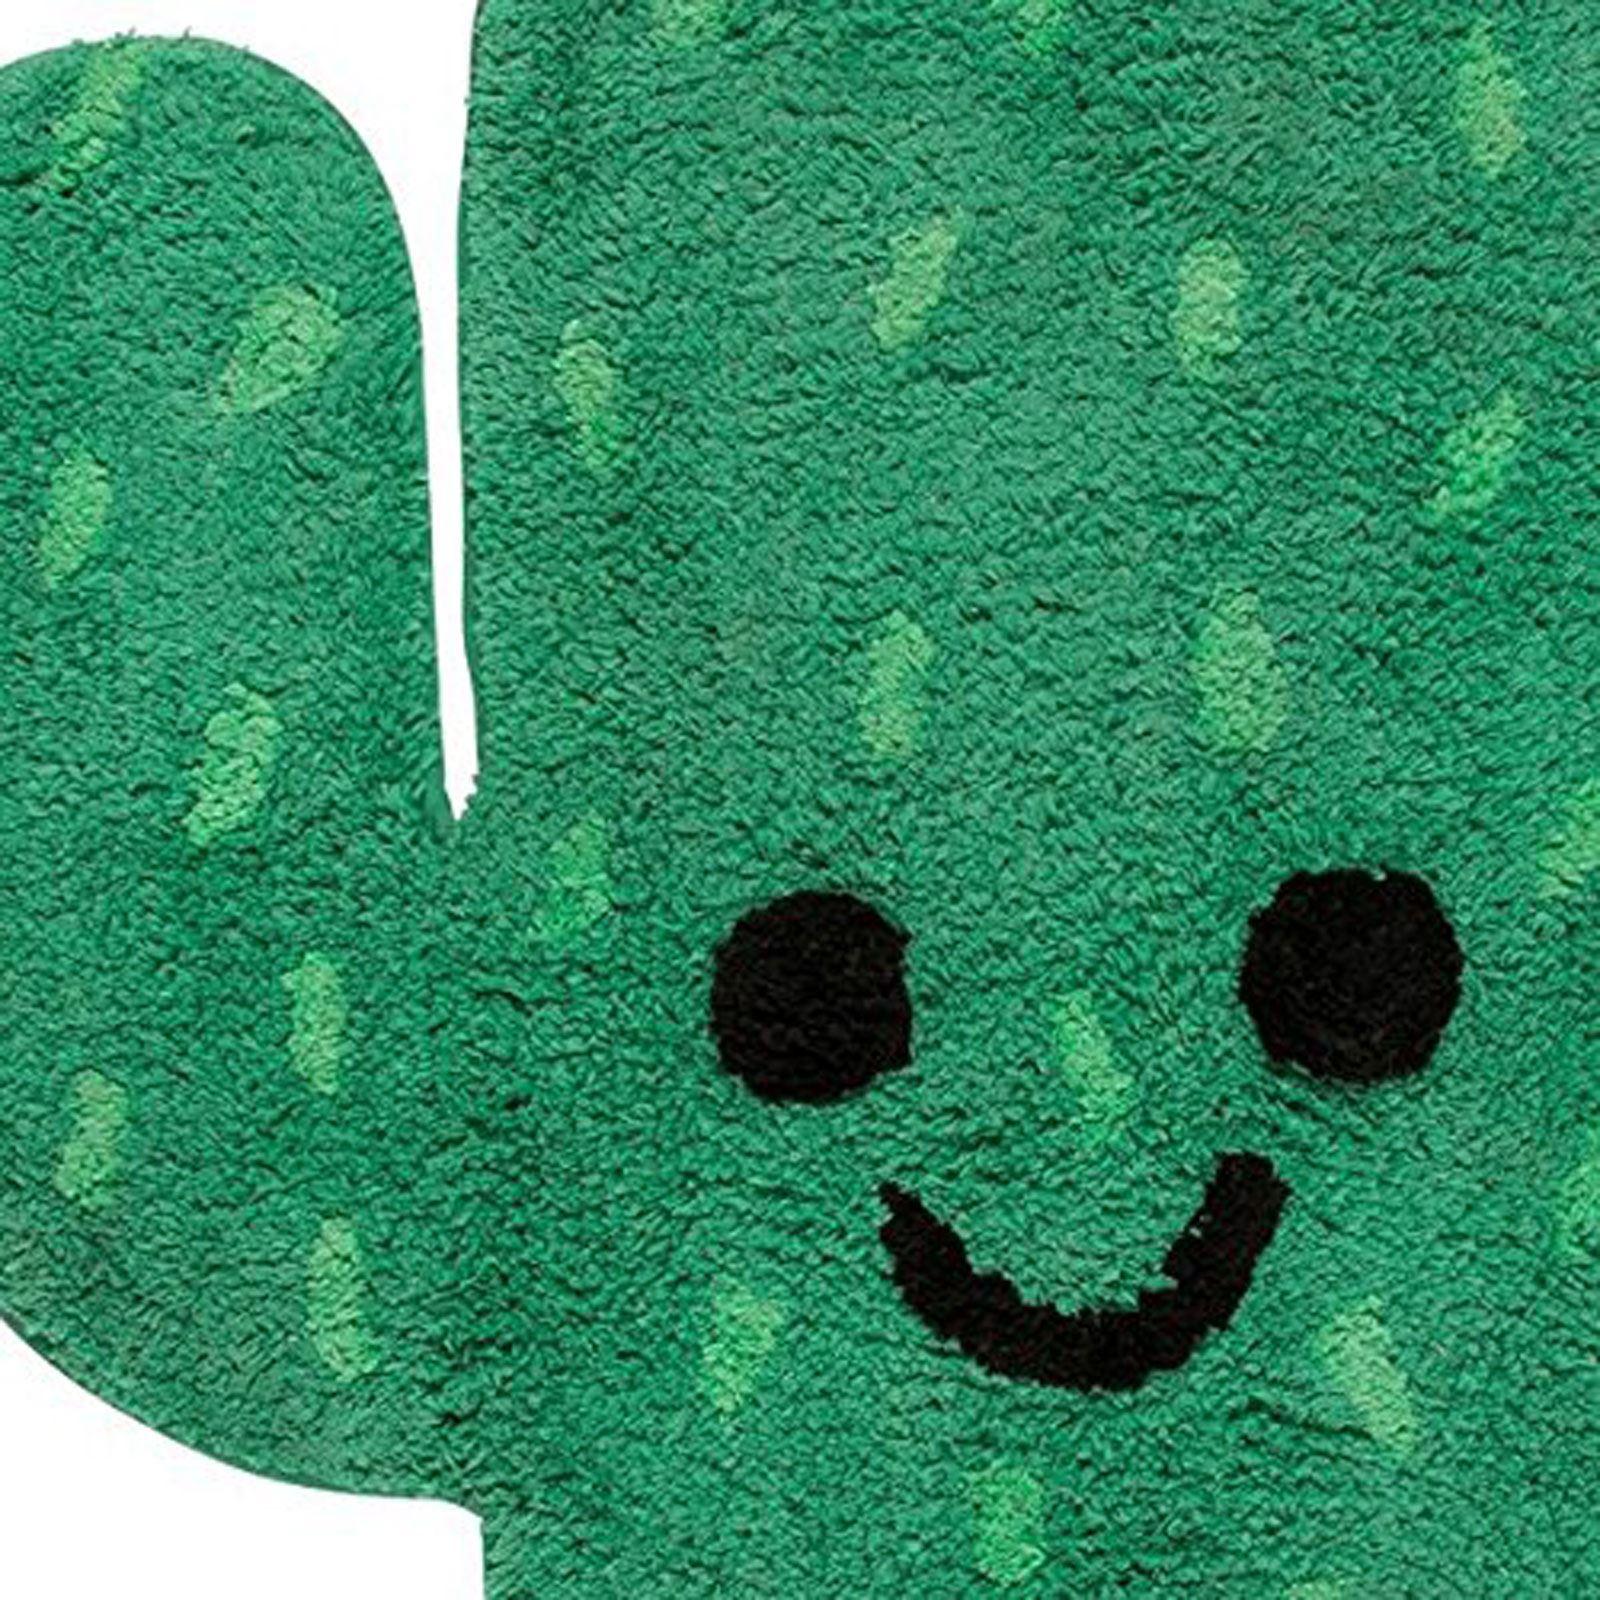 Sass-amp-Belle-Plancher-Tapis-Kids-Mermaid-Shell-Cloud-Cactus-Panda-Ananas